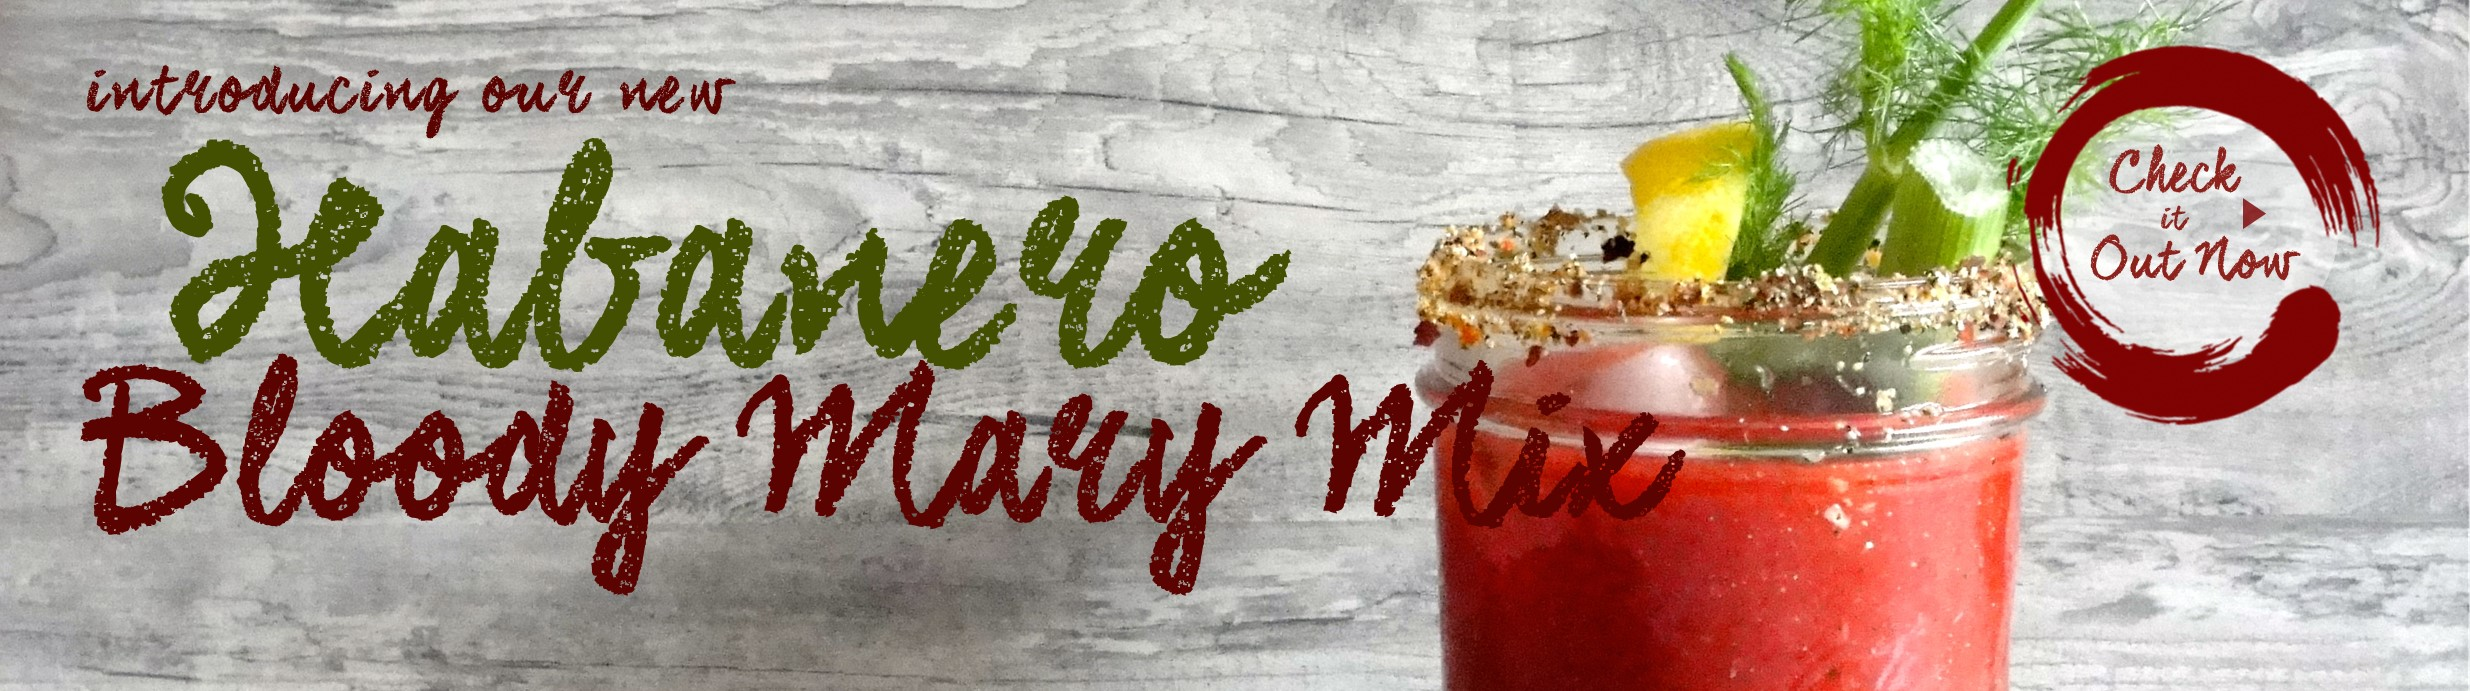 Habenero Bloody Mary Mix